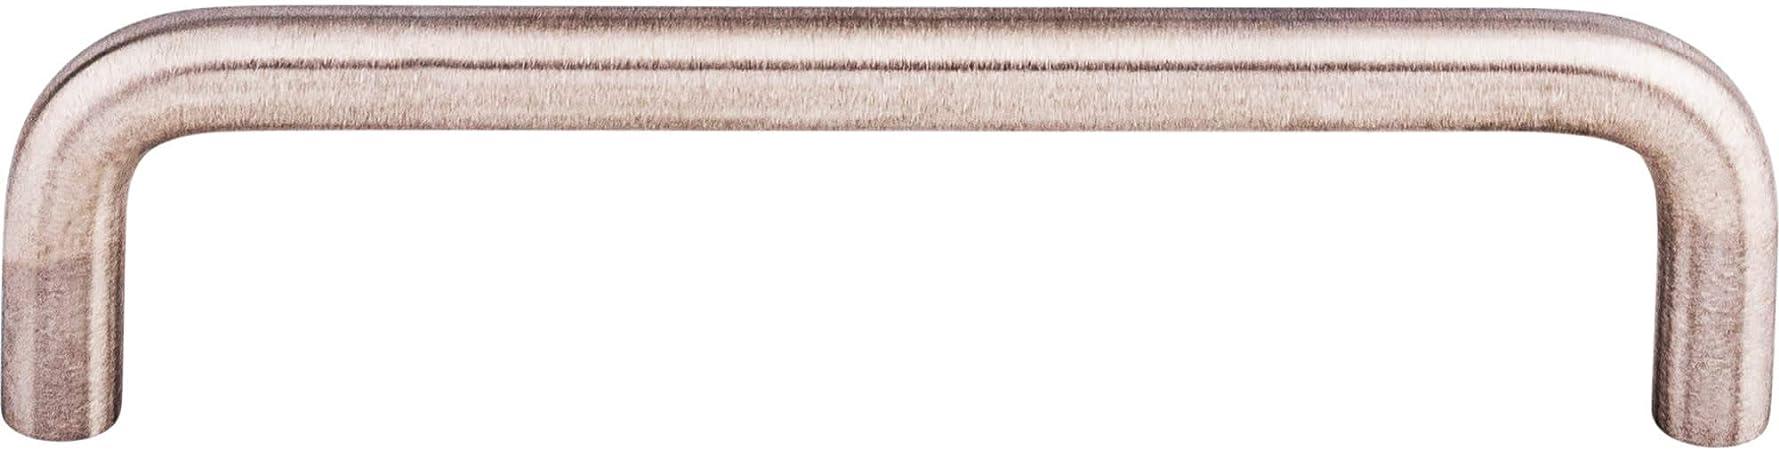 Bent Bar 5 1 16 C C 10mm Diameter Brushed Stainless Steel Amazon Com